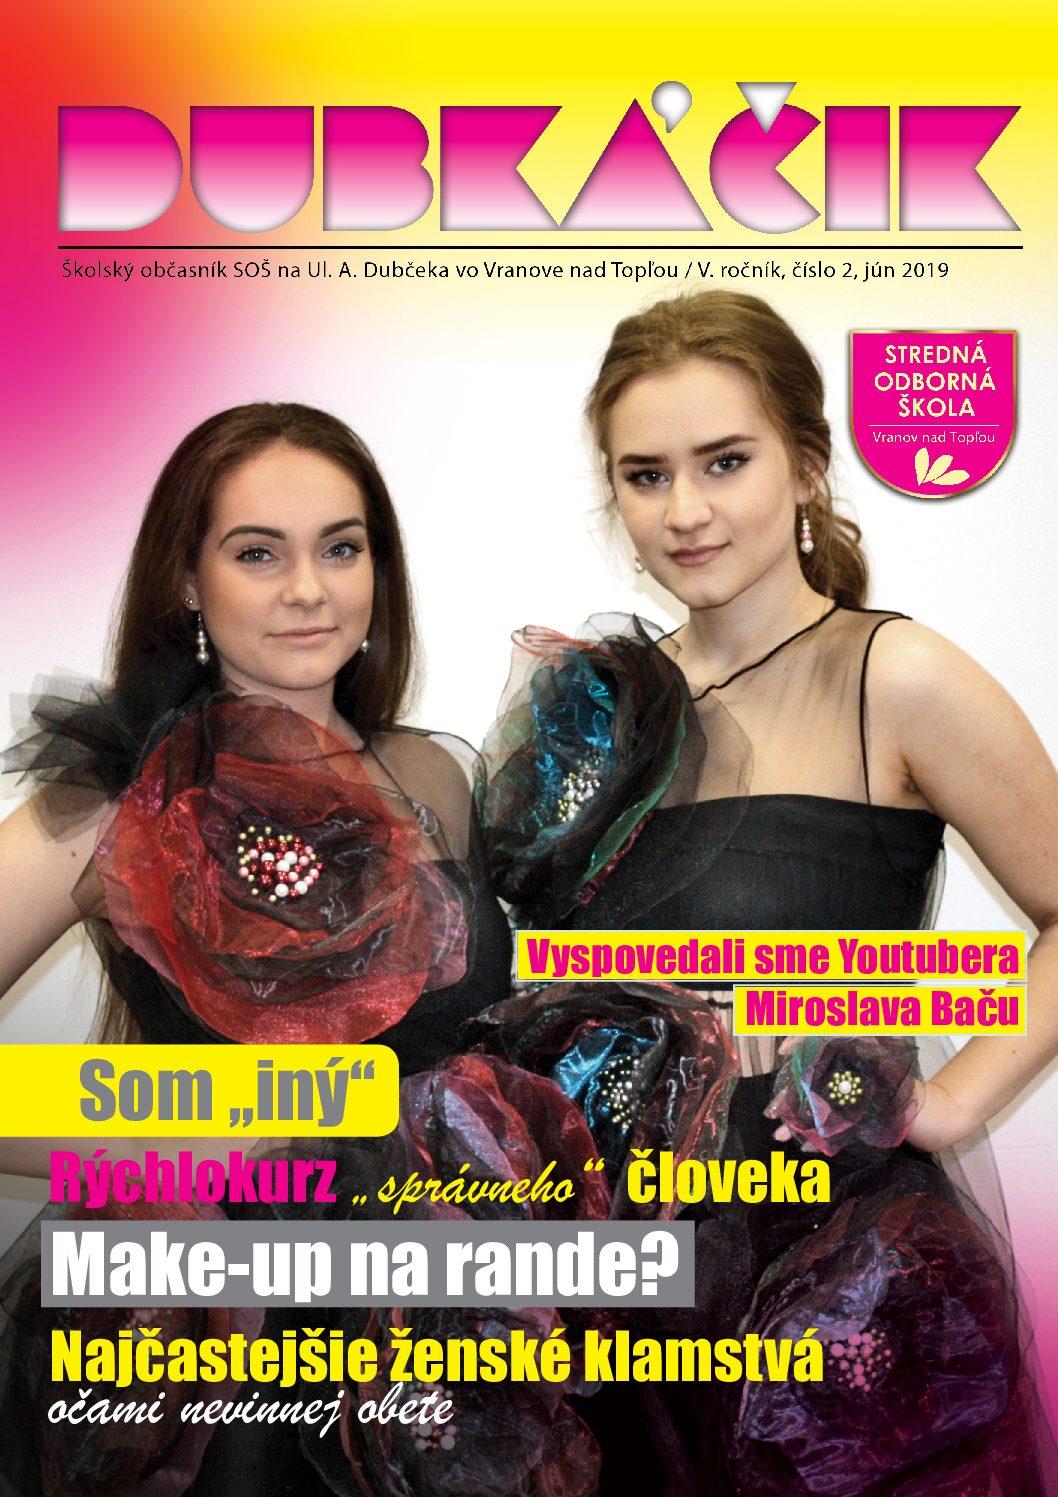 Dubkacik 2019 10 netOKO pdf